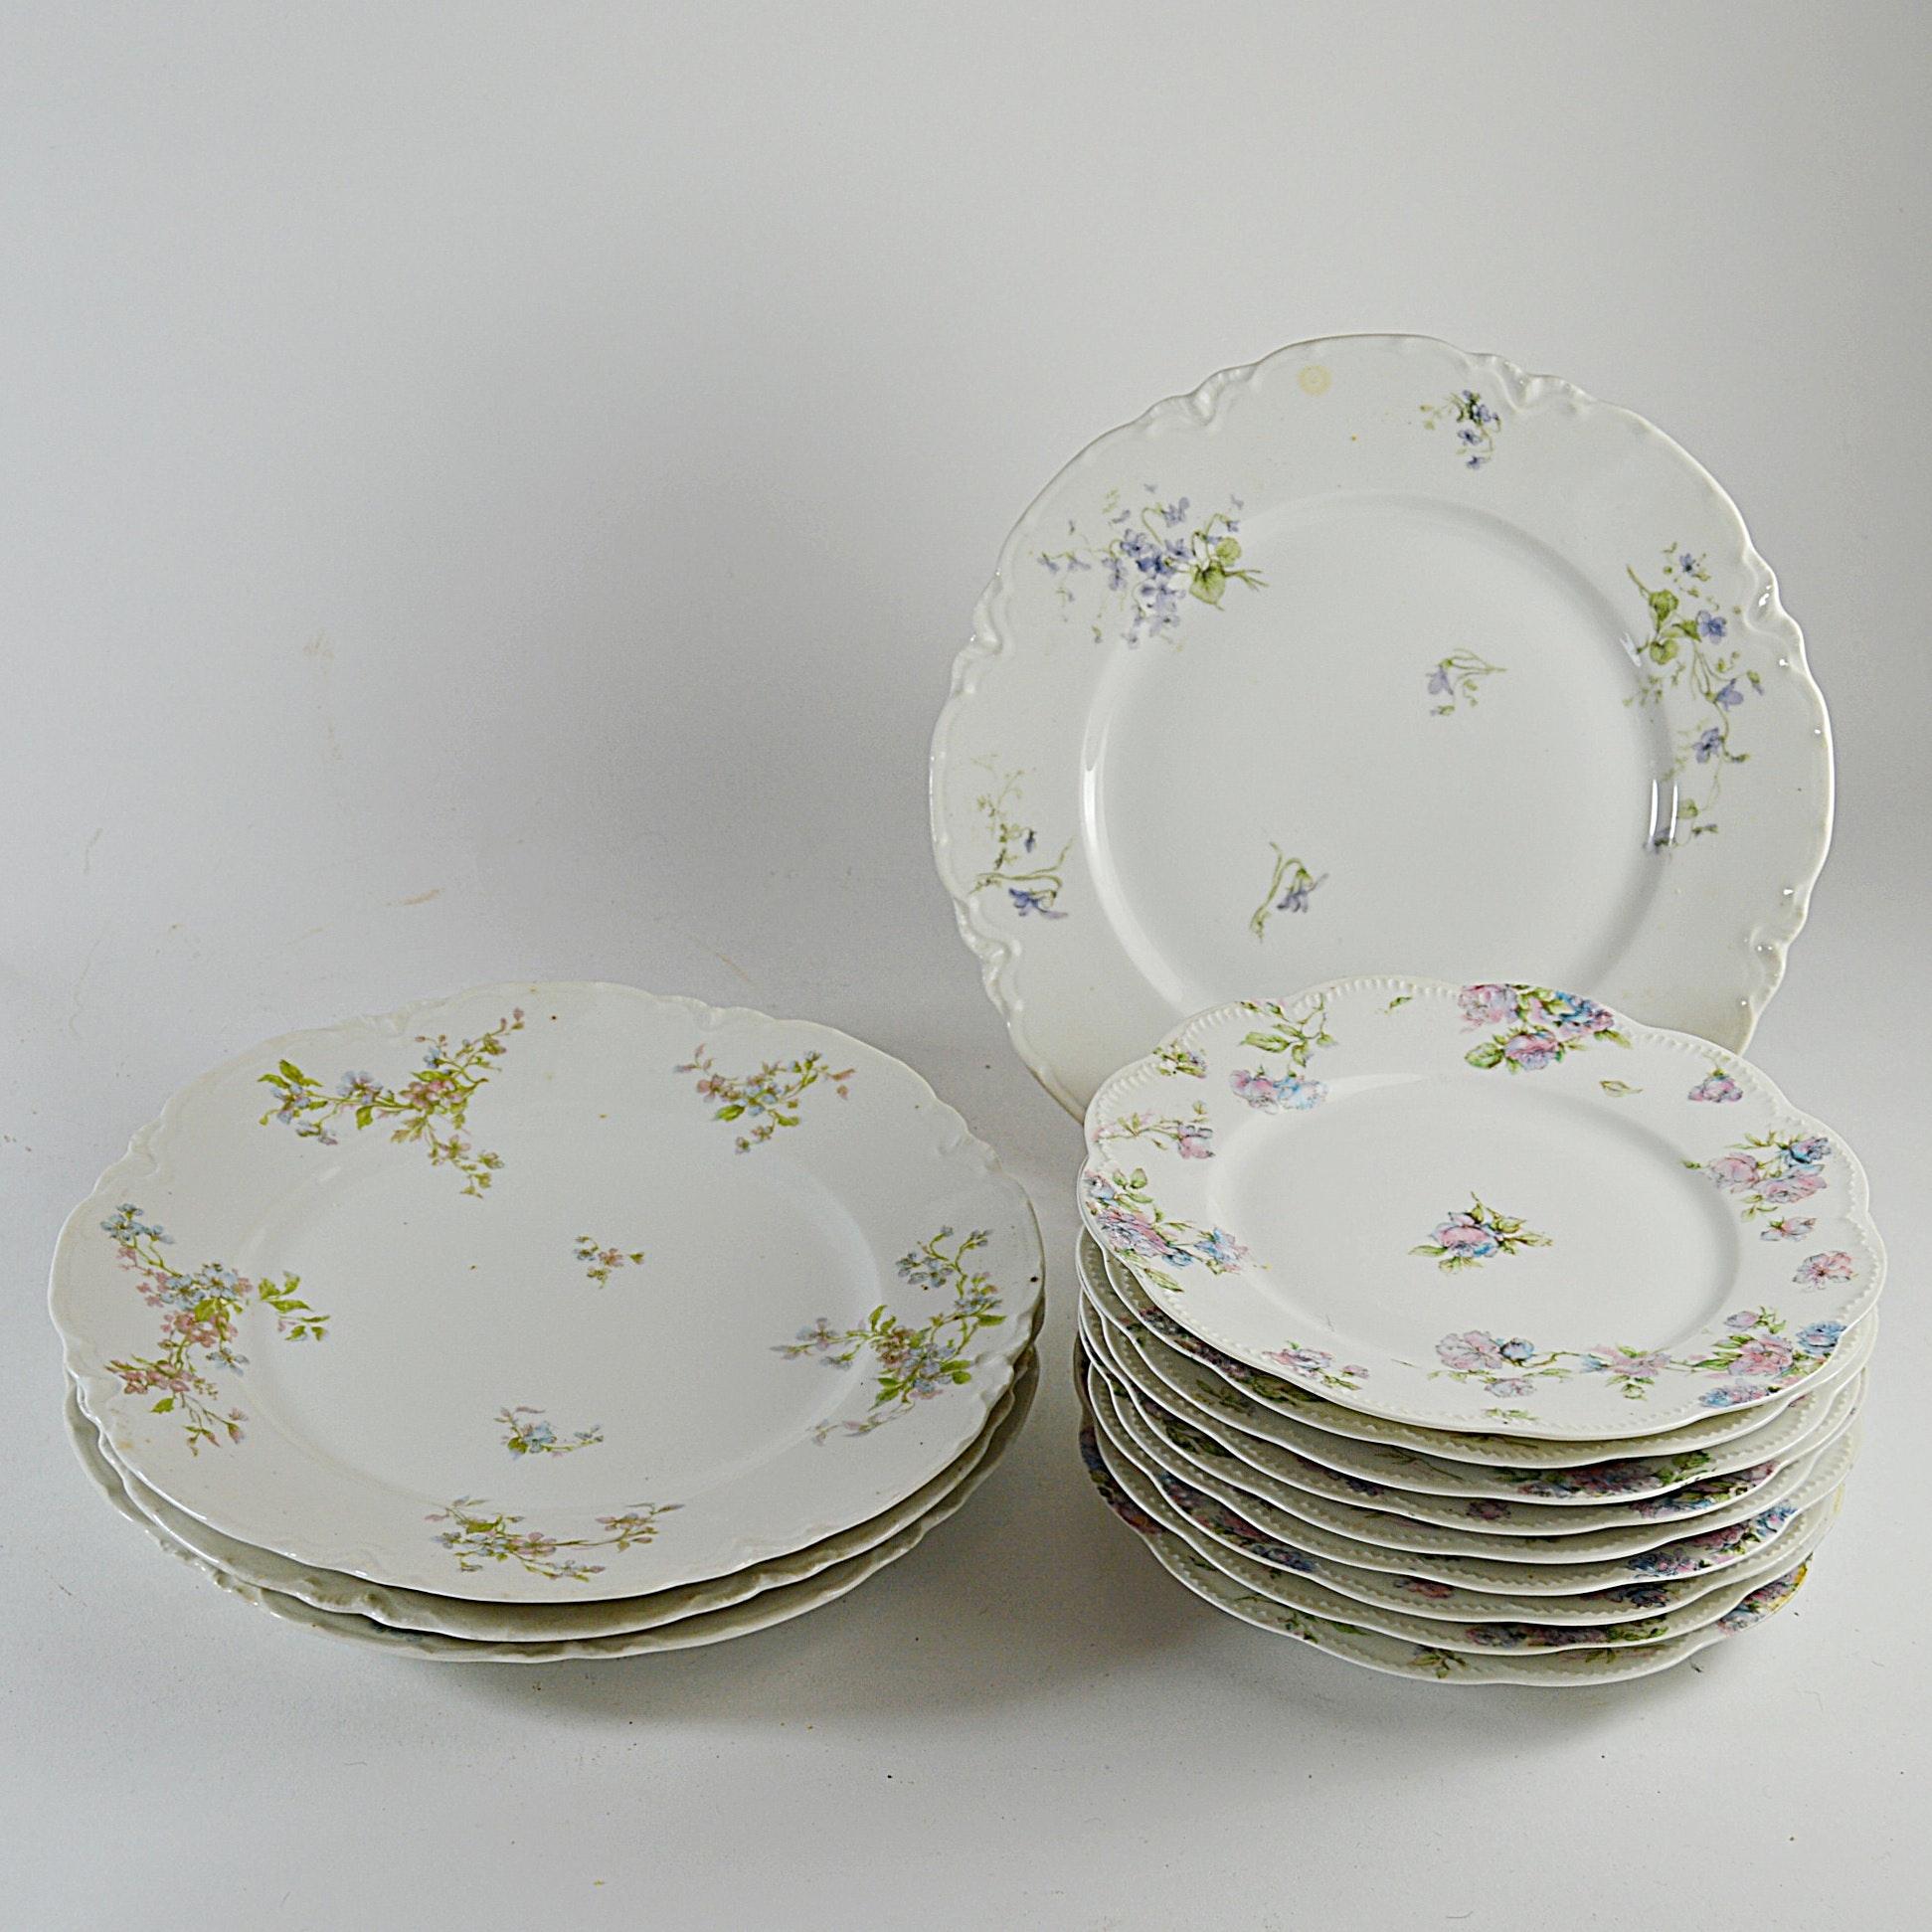 Antique French Haviland Limoges Plates ... & Antique French Haviland Limoges Plates : EBTH